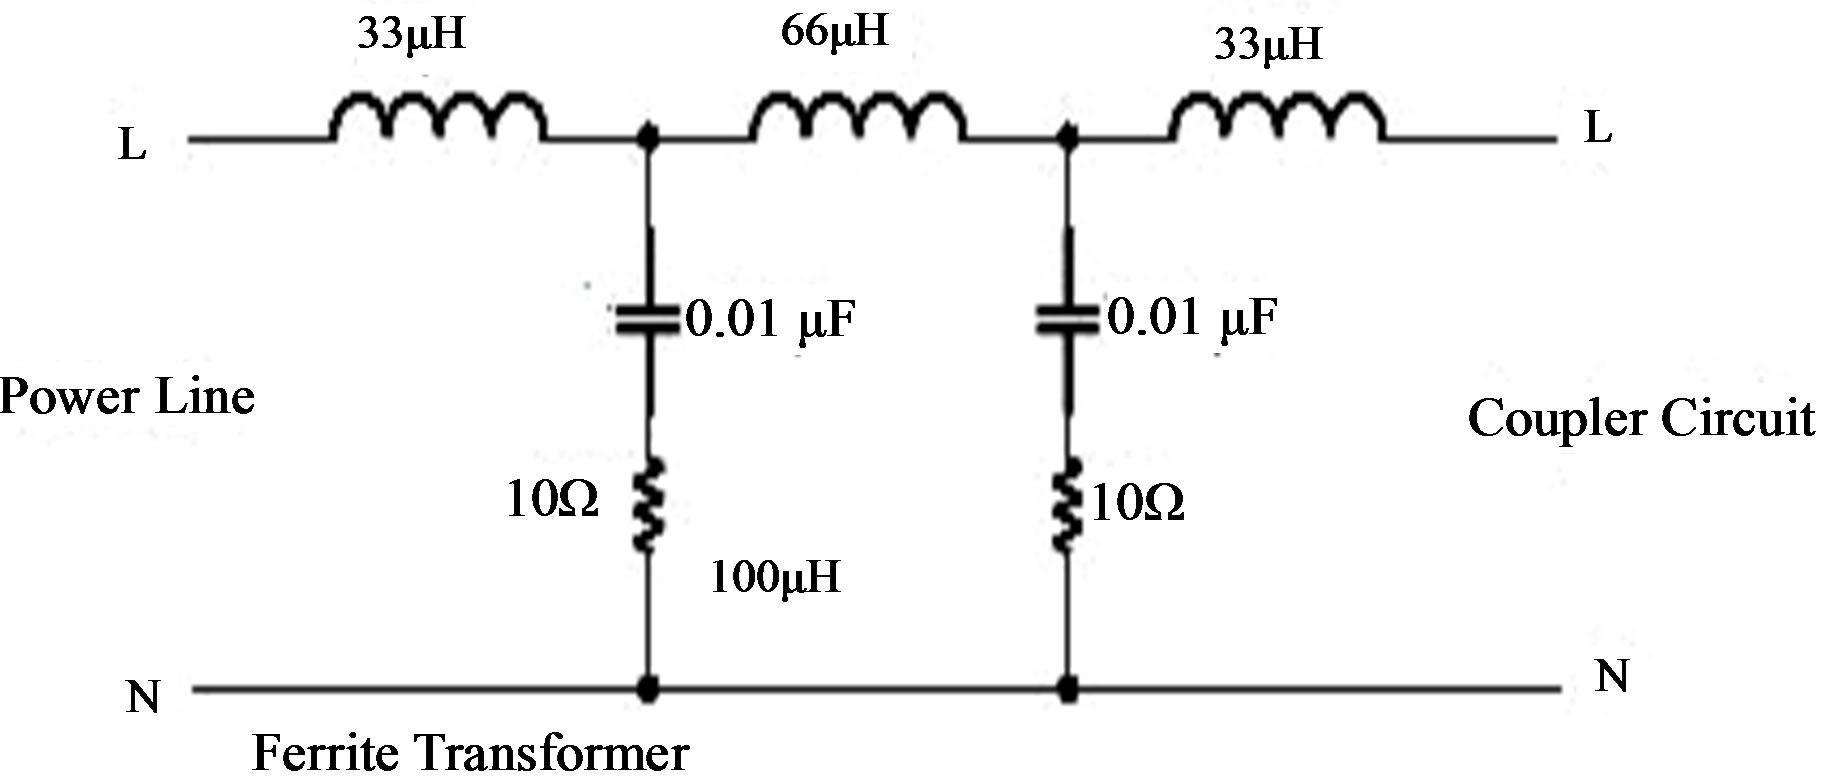 Design Of Bidirectional Coupling Circuit For Broadband